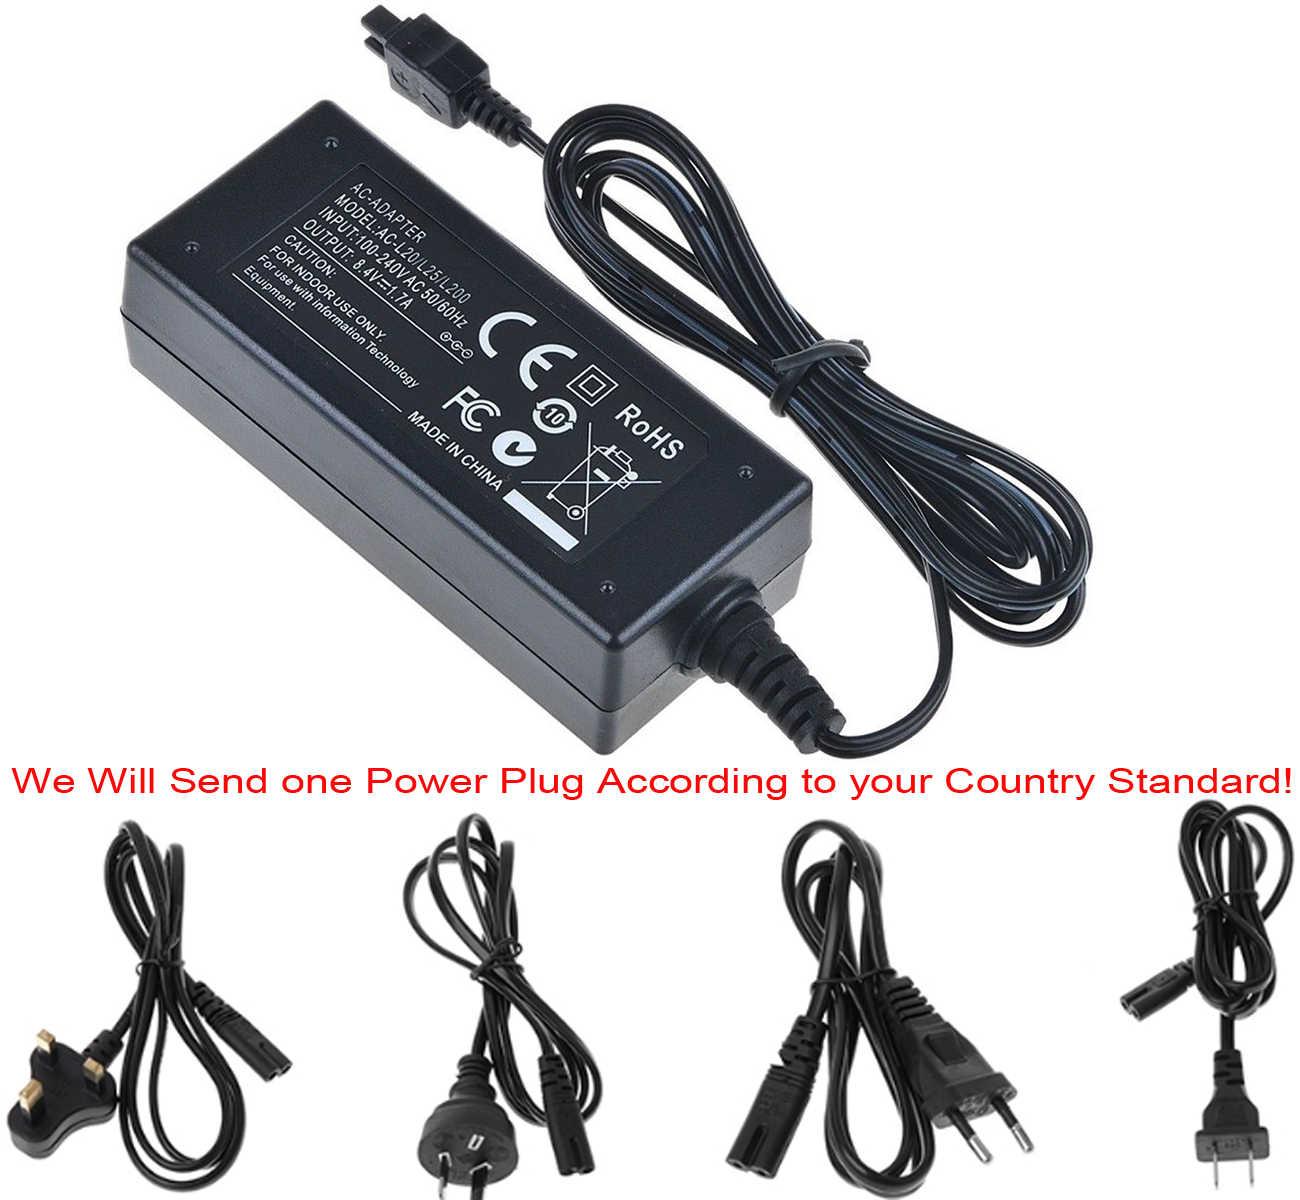 AC アダプタ充電器ソニー HDR-CX100 、 CX110 、 CX130 、 CX150 、 CX160 、 CX190 、 CX200 、 CX210 、 CX220 、 CX230 、 CX260V ハンディカムビデオカメラ